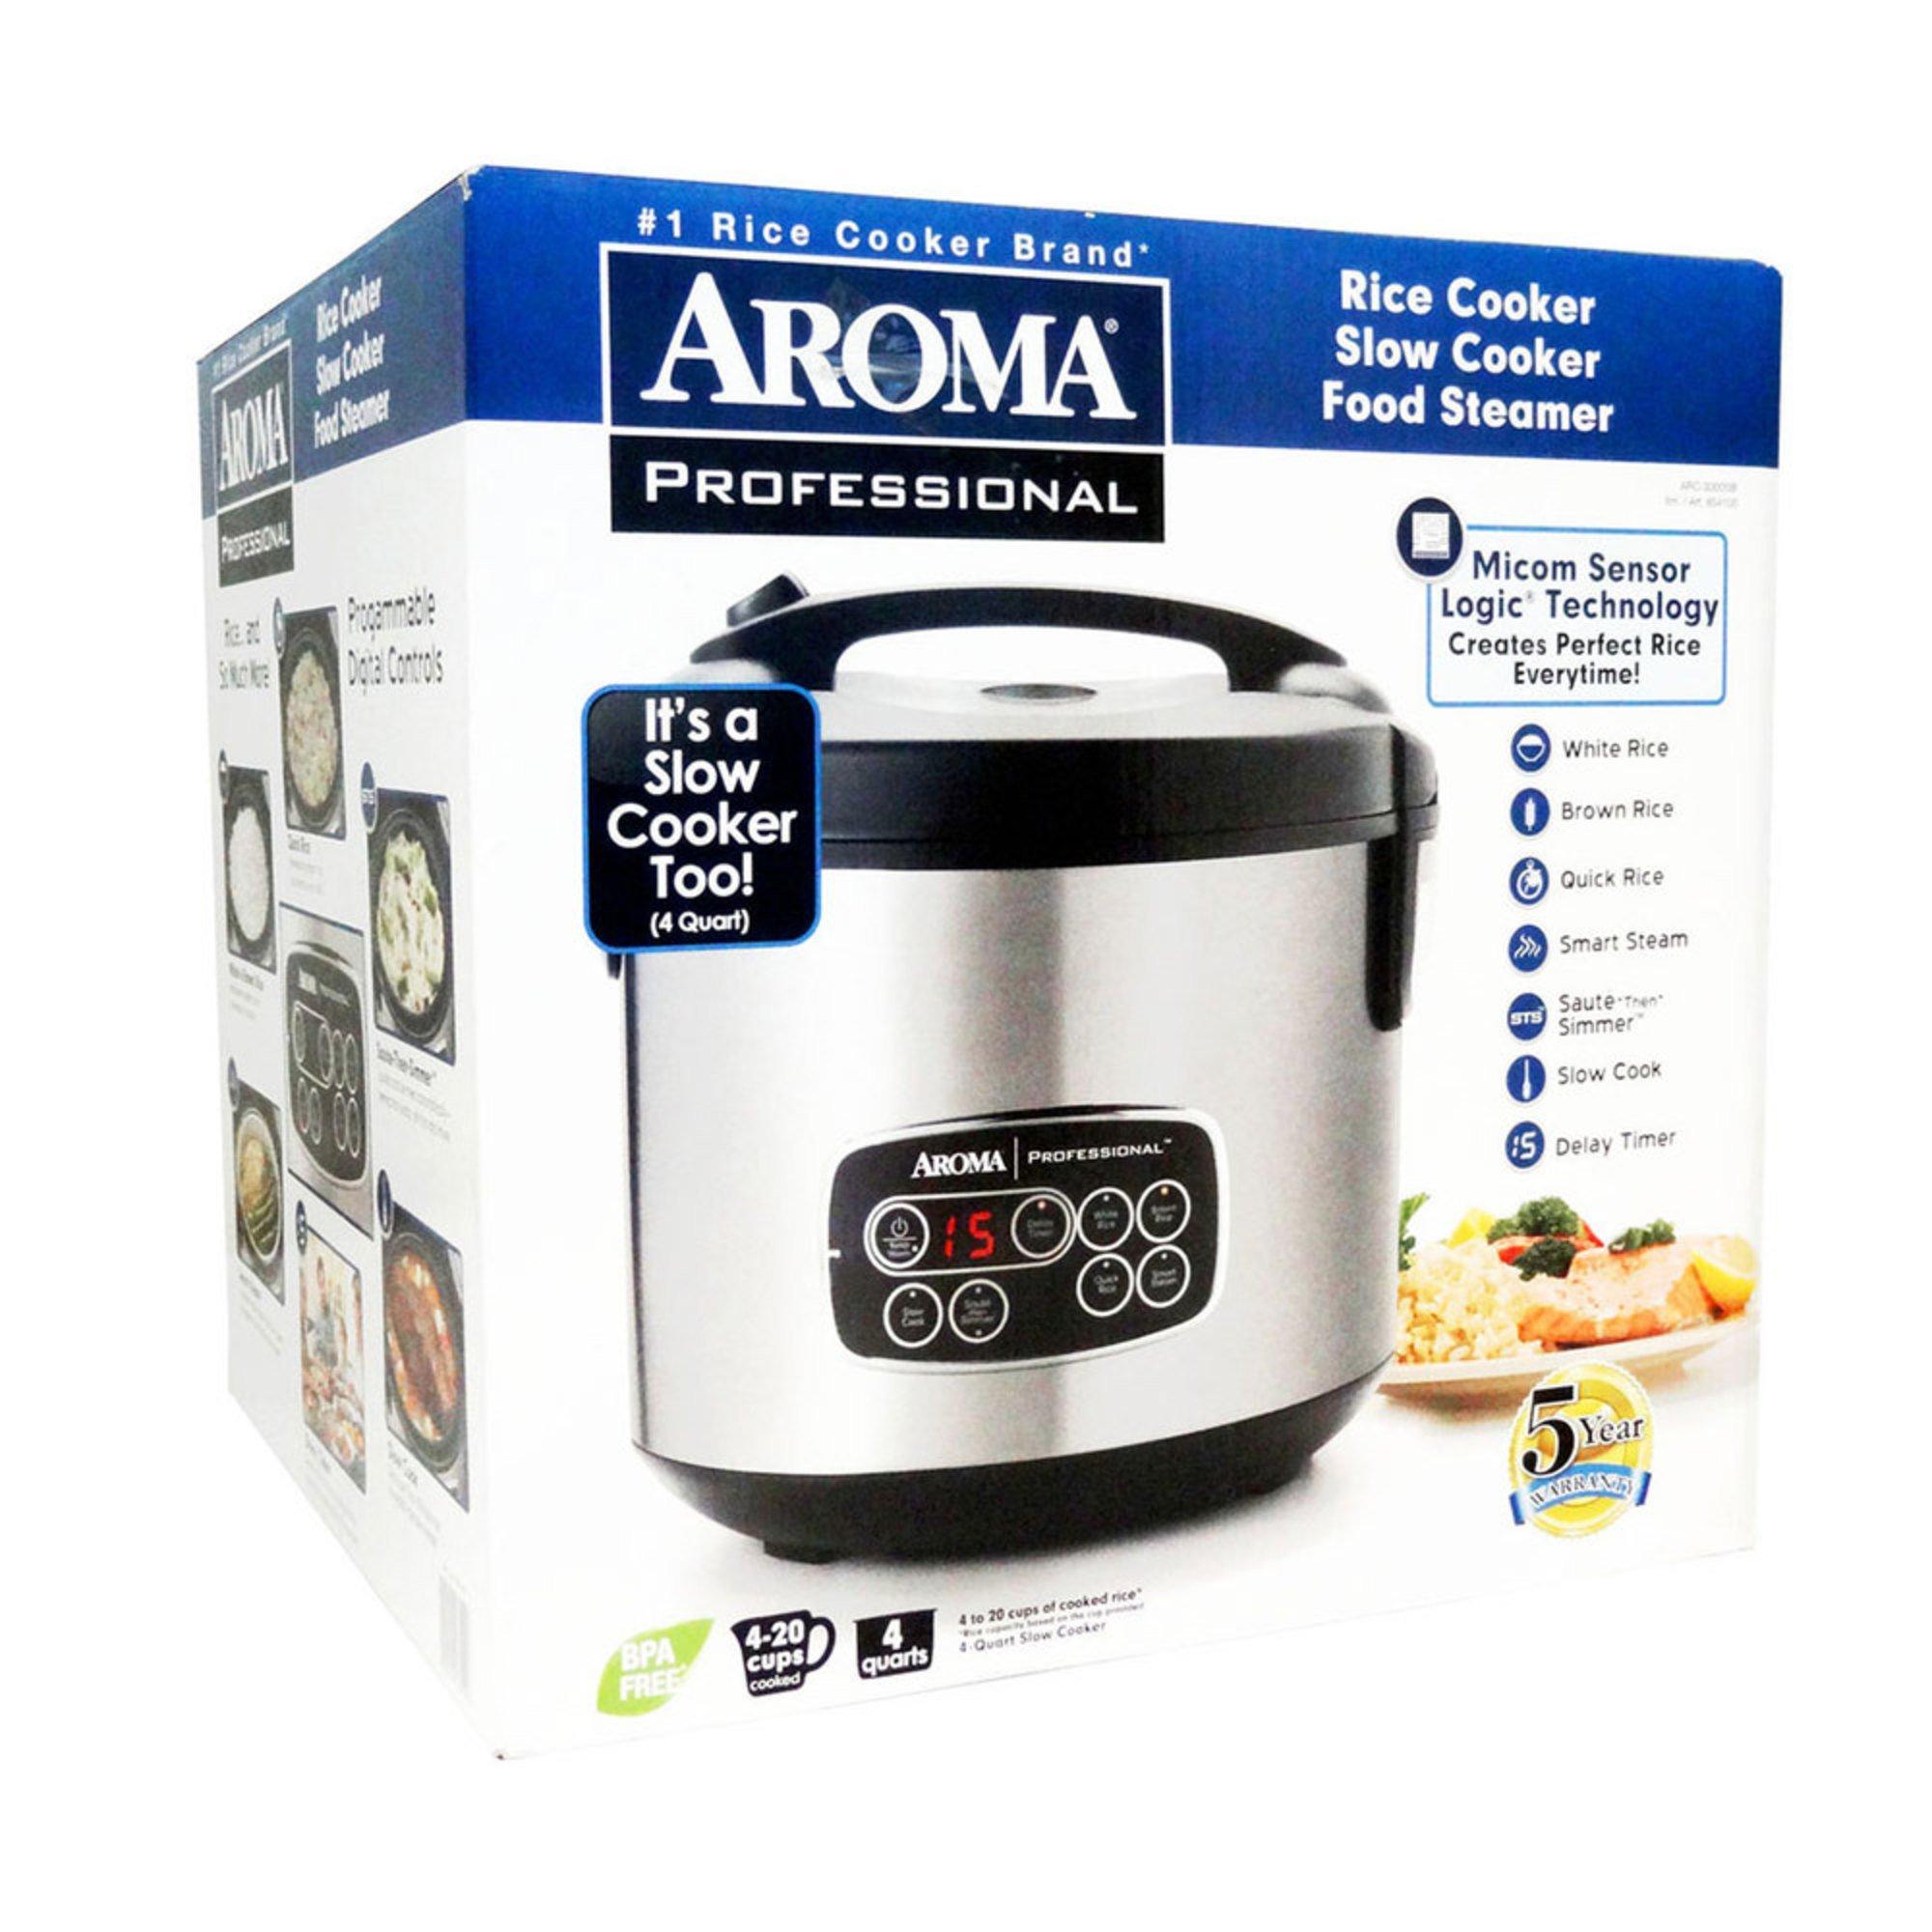 aroma professional digital rice cooker food steamer slow cooker 20 cup arc 3000sb rice. Black Bedroom Furniture Sets. Home Design Ideas